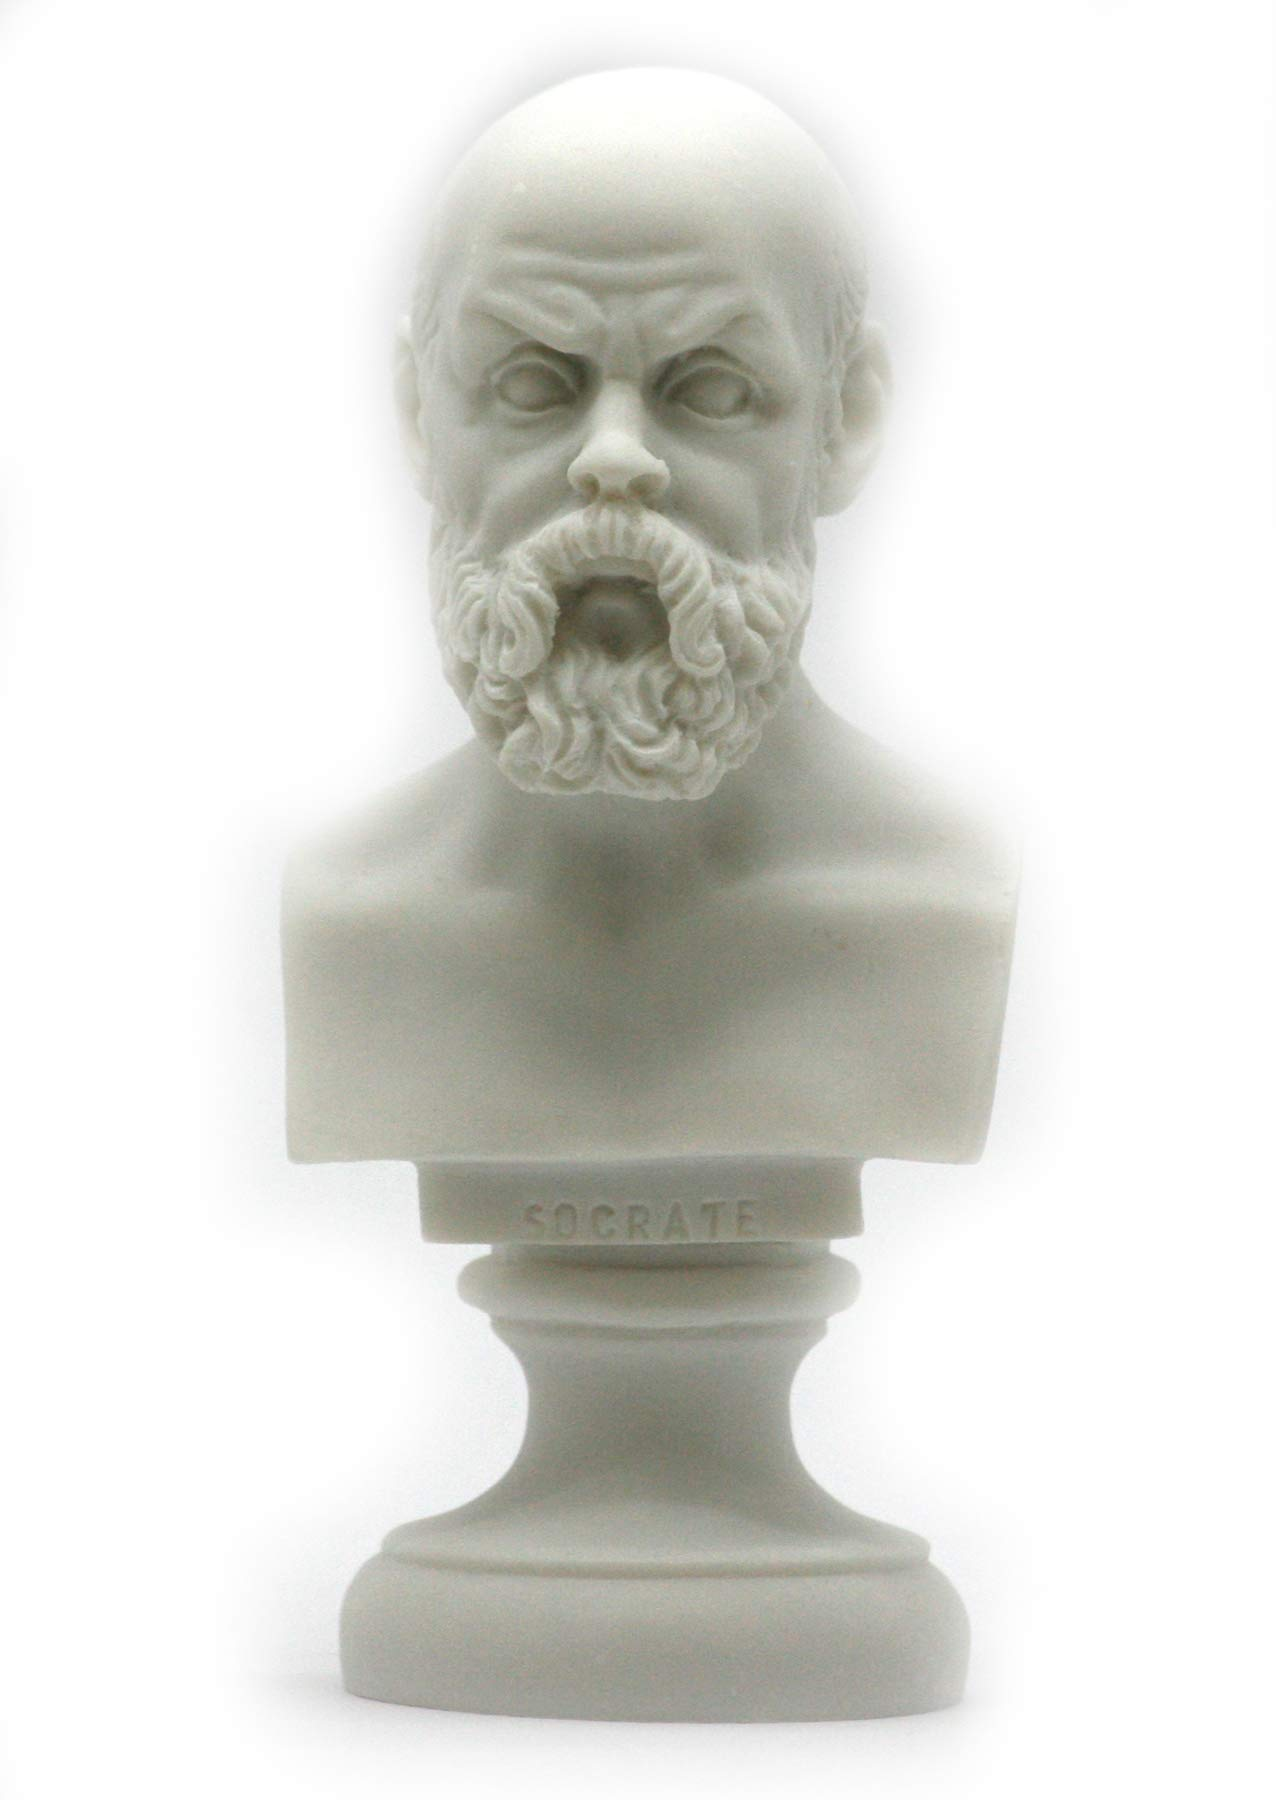 Greek Philosopher SOCRATES Alabaster Bust Head Statue Sculpture Décor 5.9΄΄ by Unknown